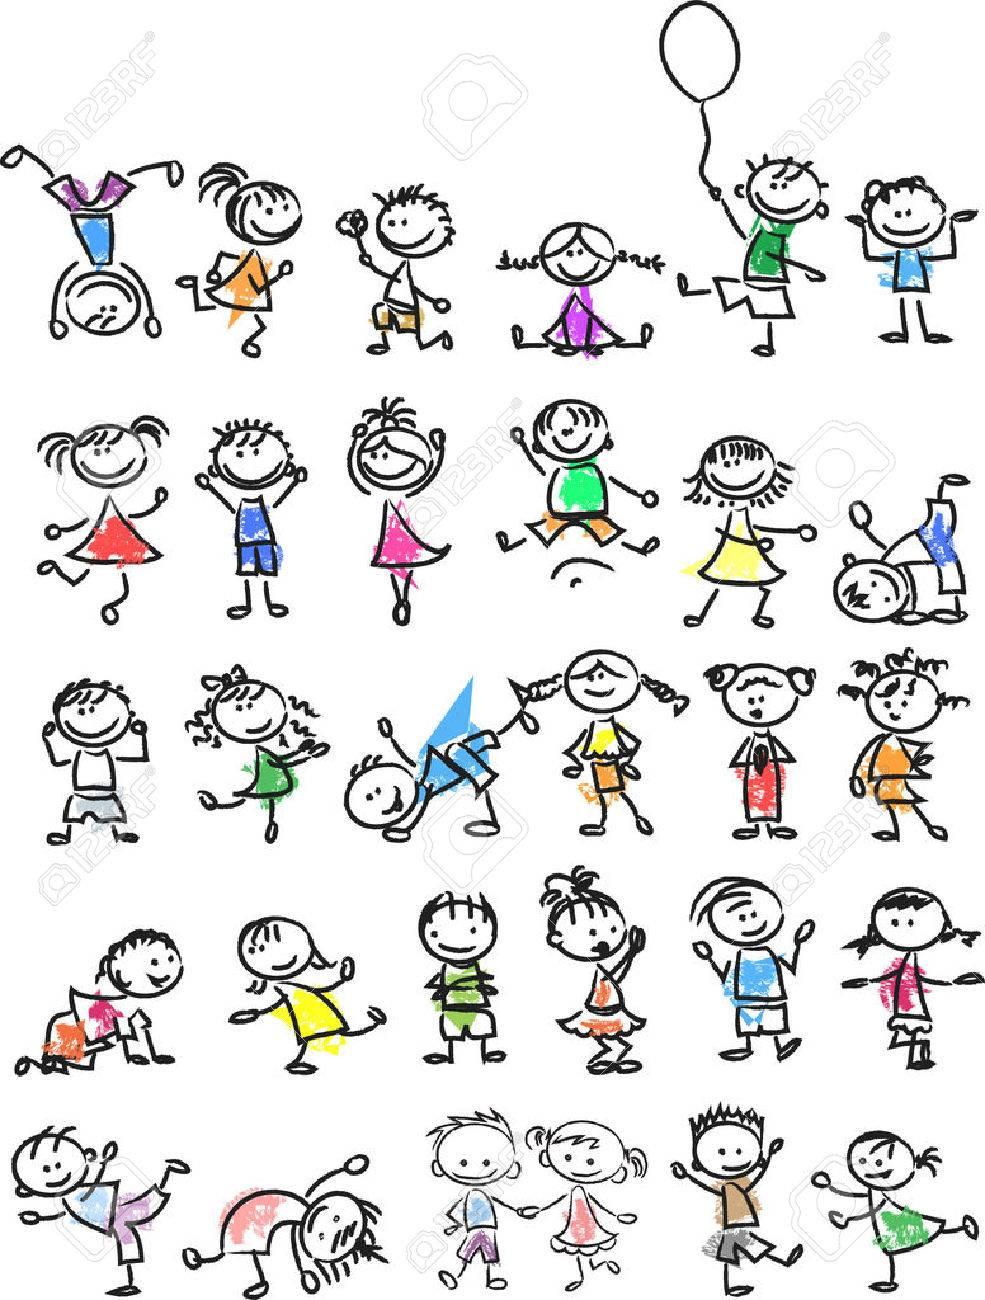 Cute happy cartoon doodle kids - 33650209